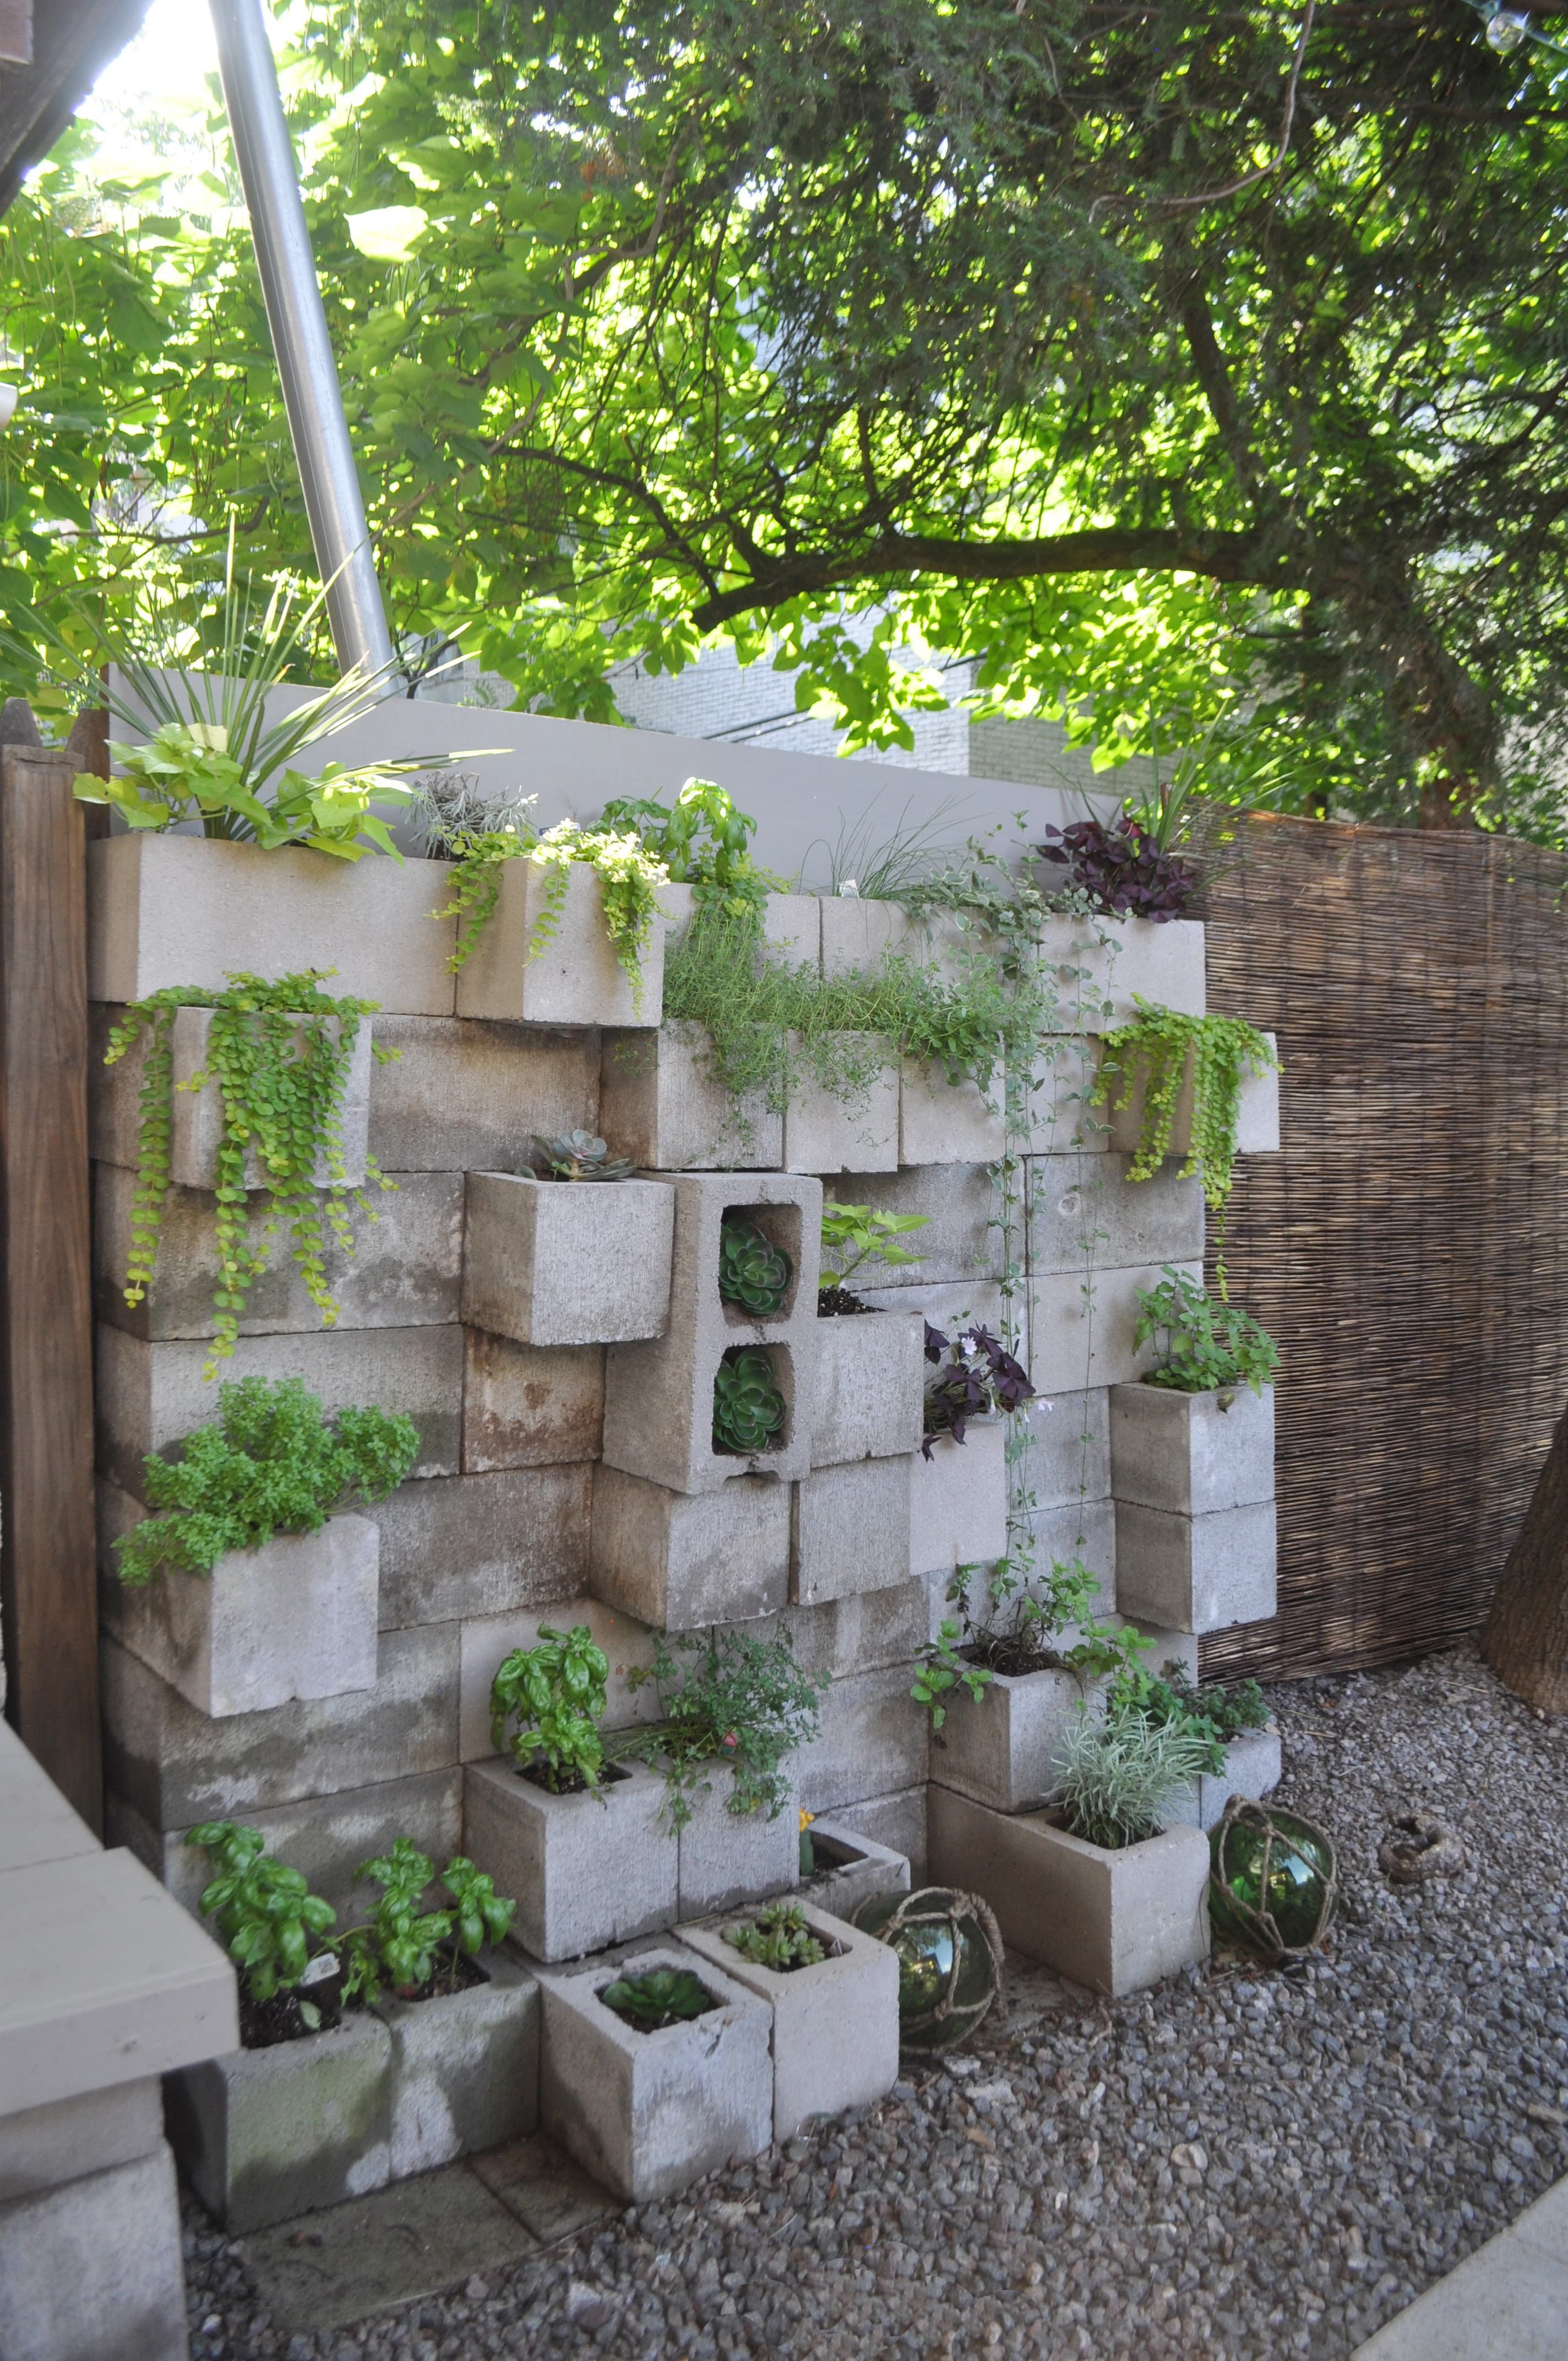 Budget Backyard: 10 Ways to Use Cheap Concrete Cinder Blocks ...